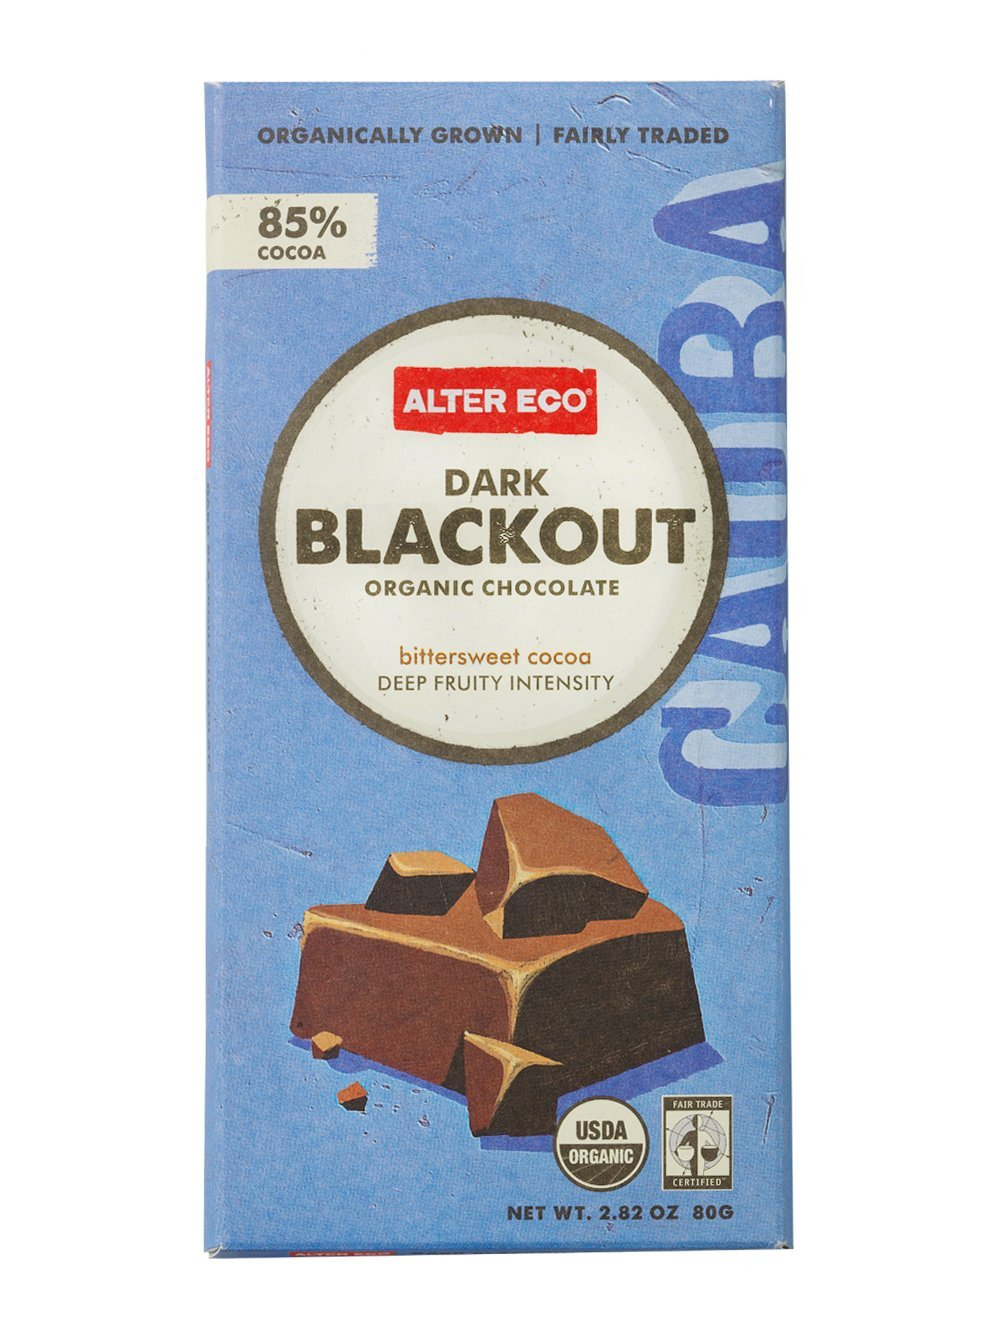 Alter Eco - Dark Blackout Organic Chocolate - 2.82 oz